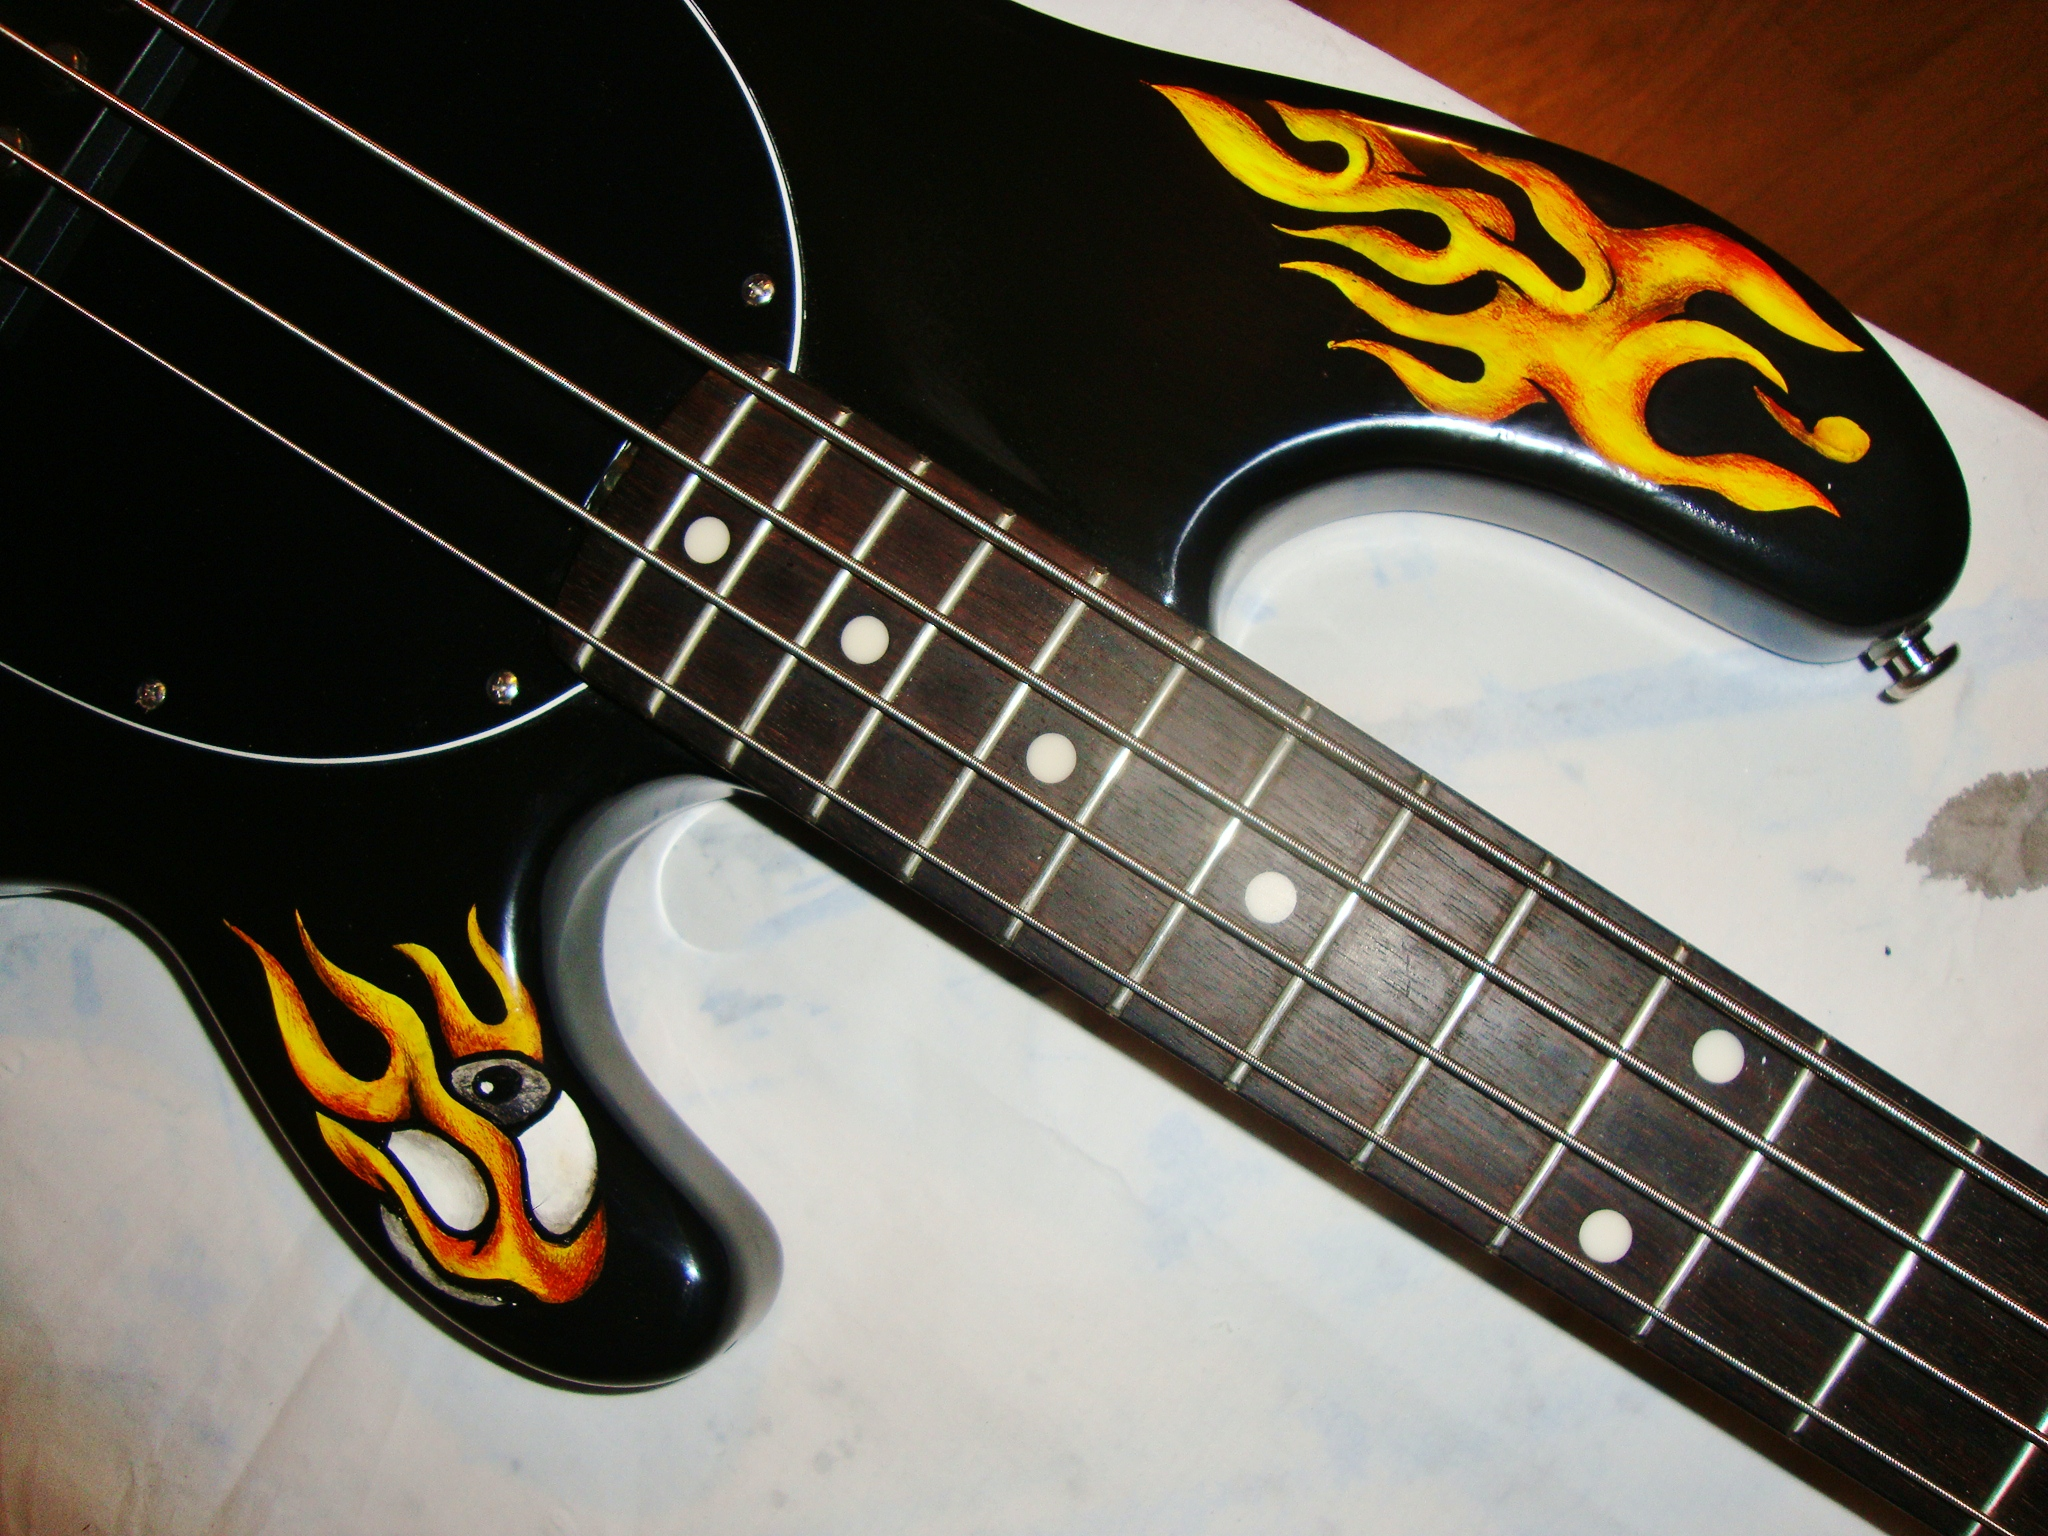 Fire on the bass